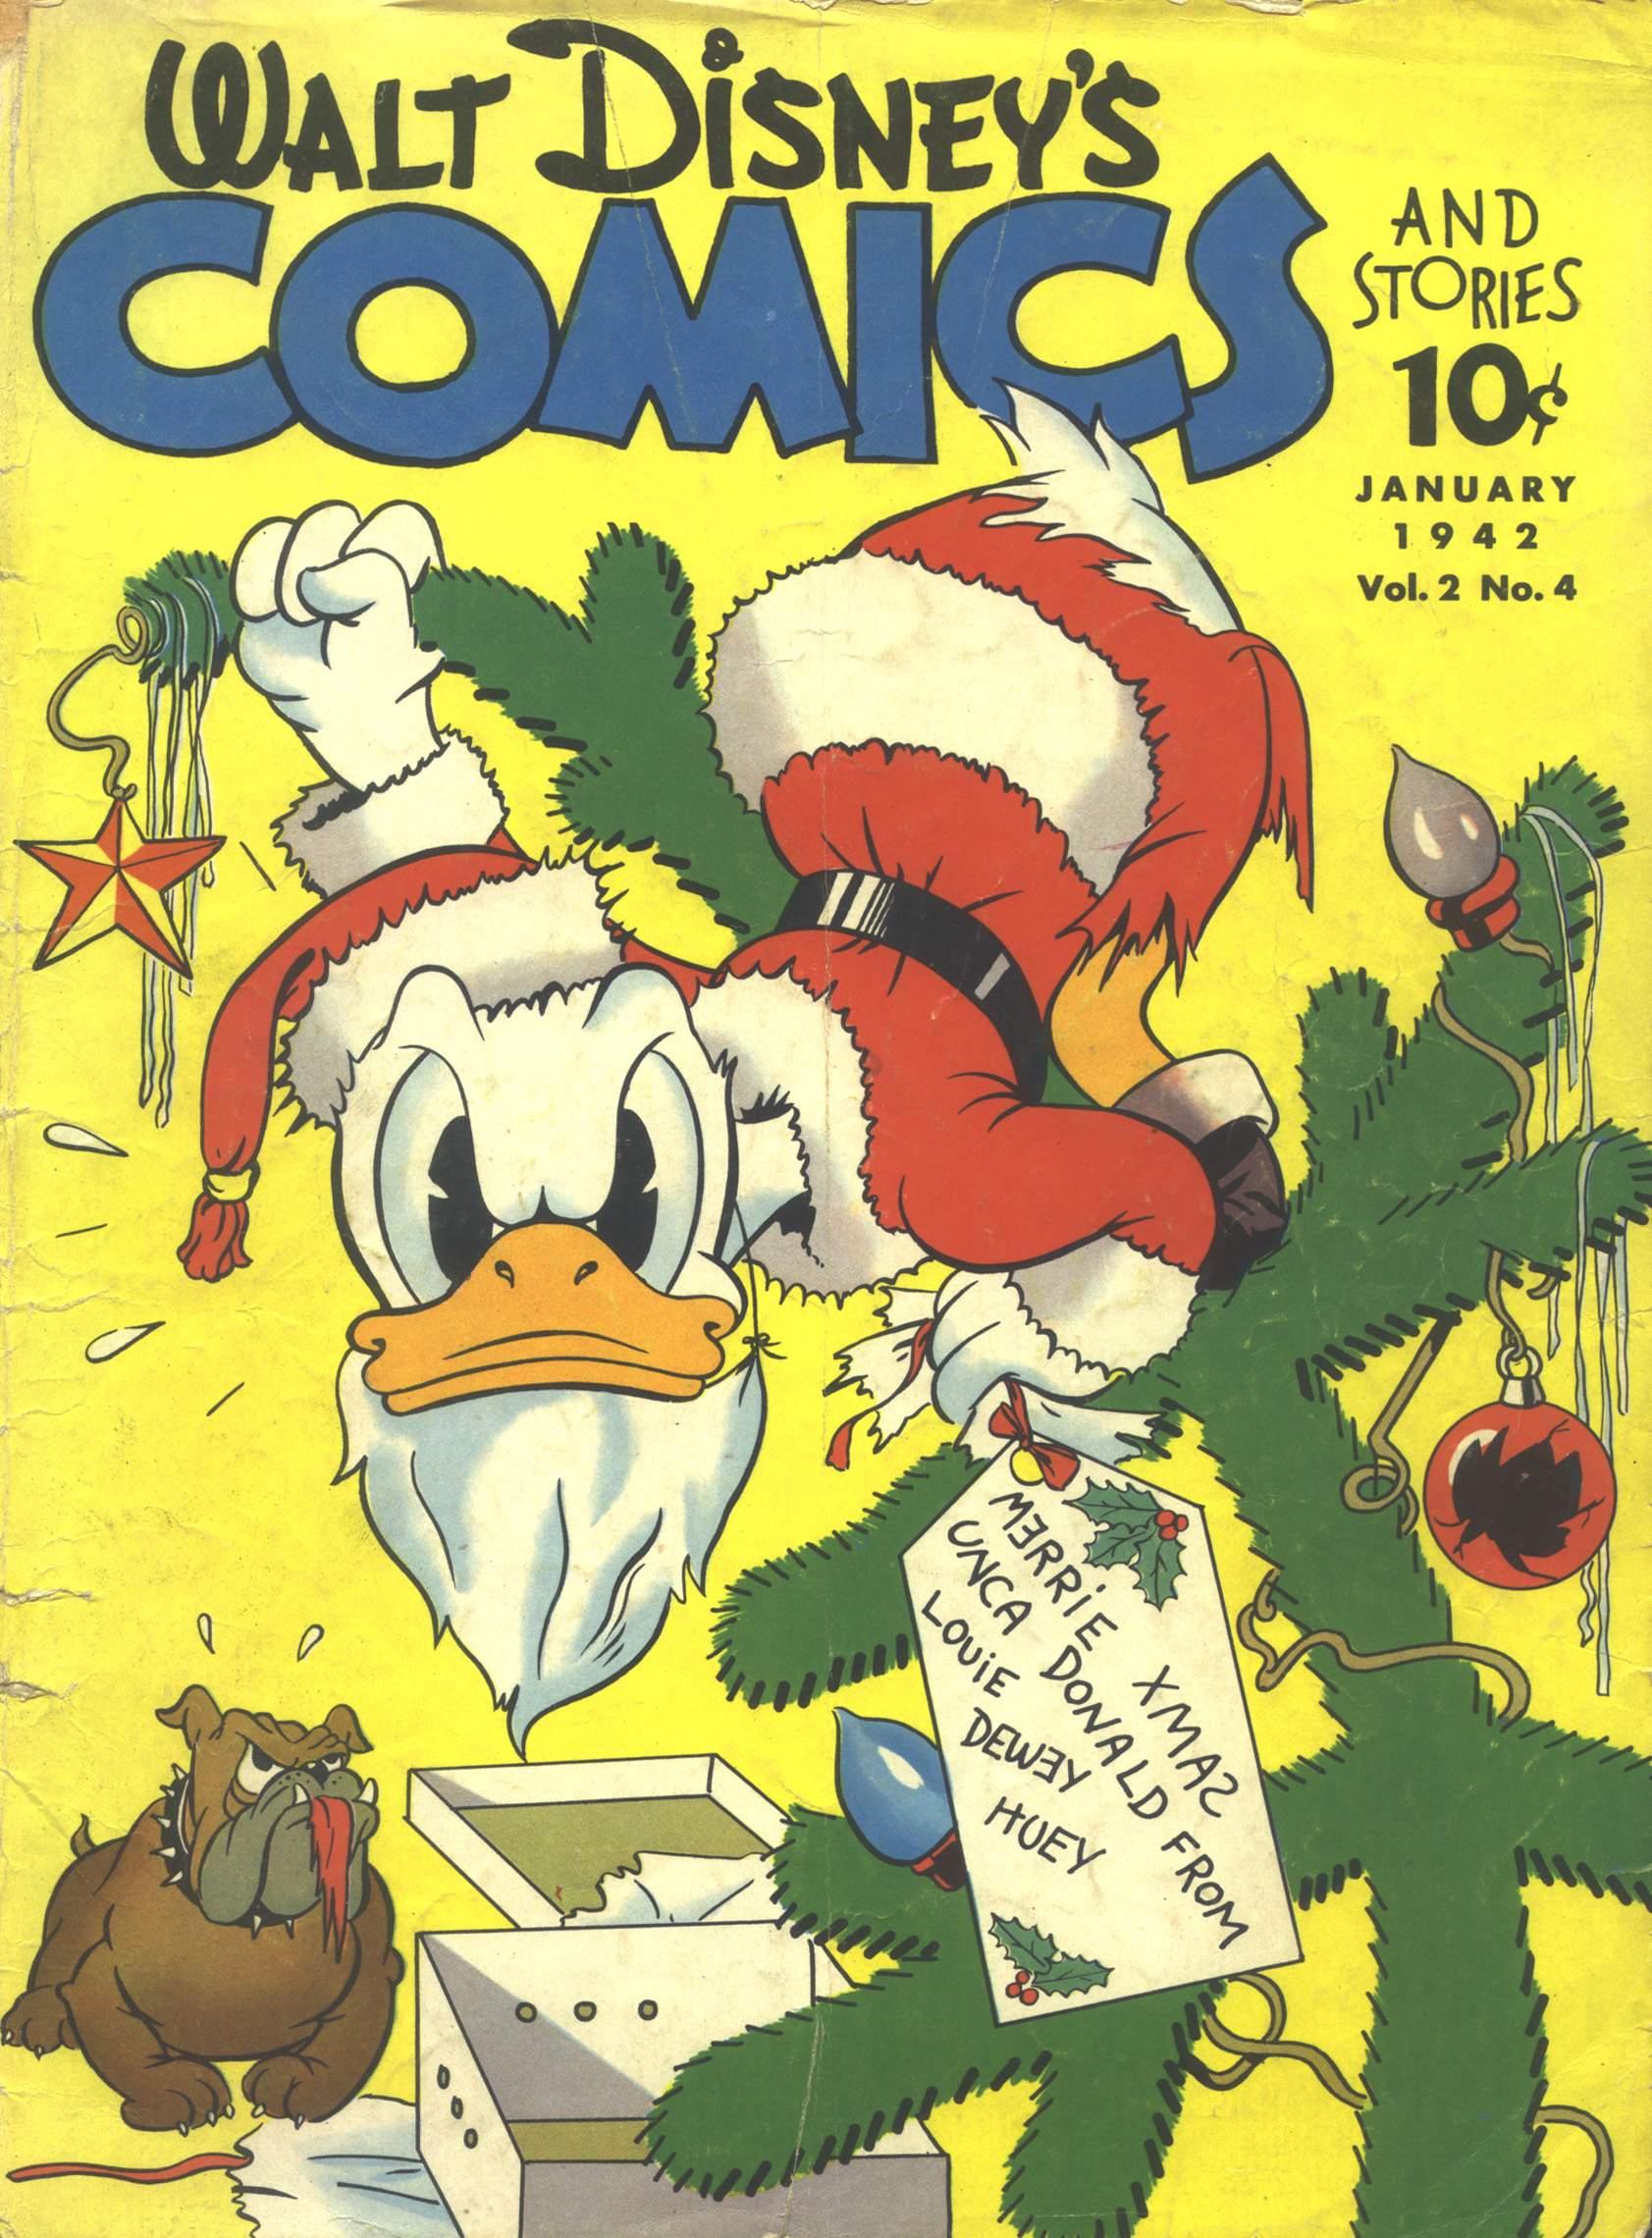 Walt Disneys Comics and Stories 16 Page 1